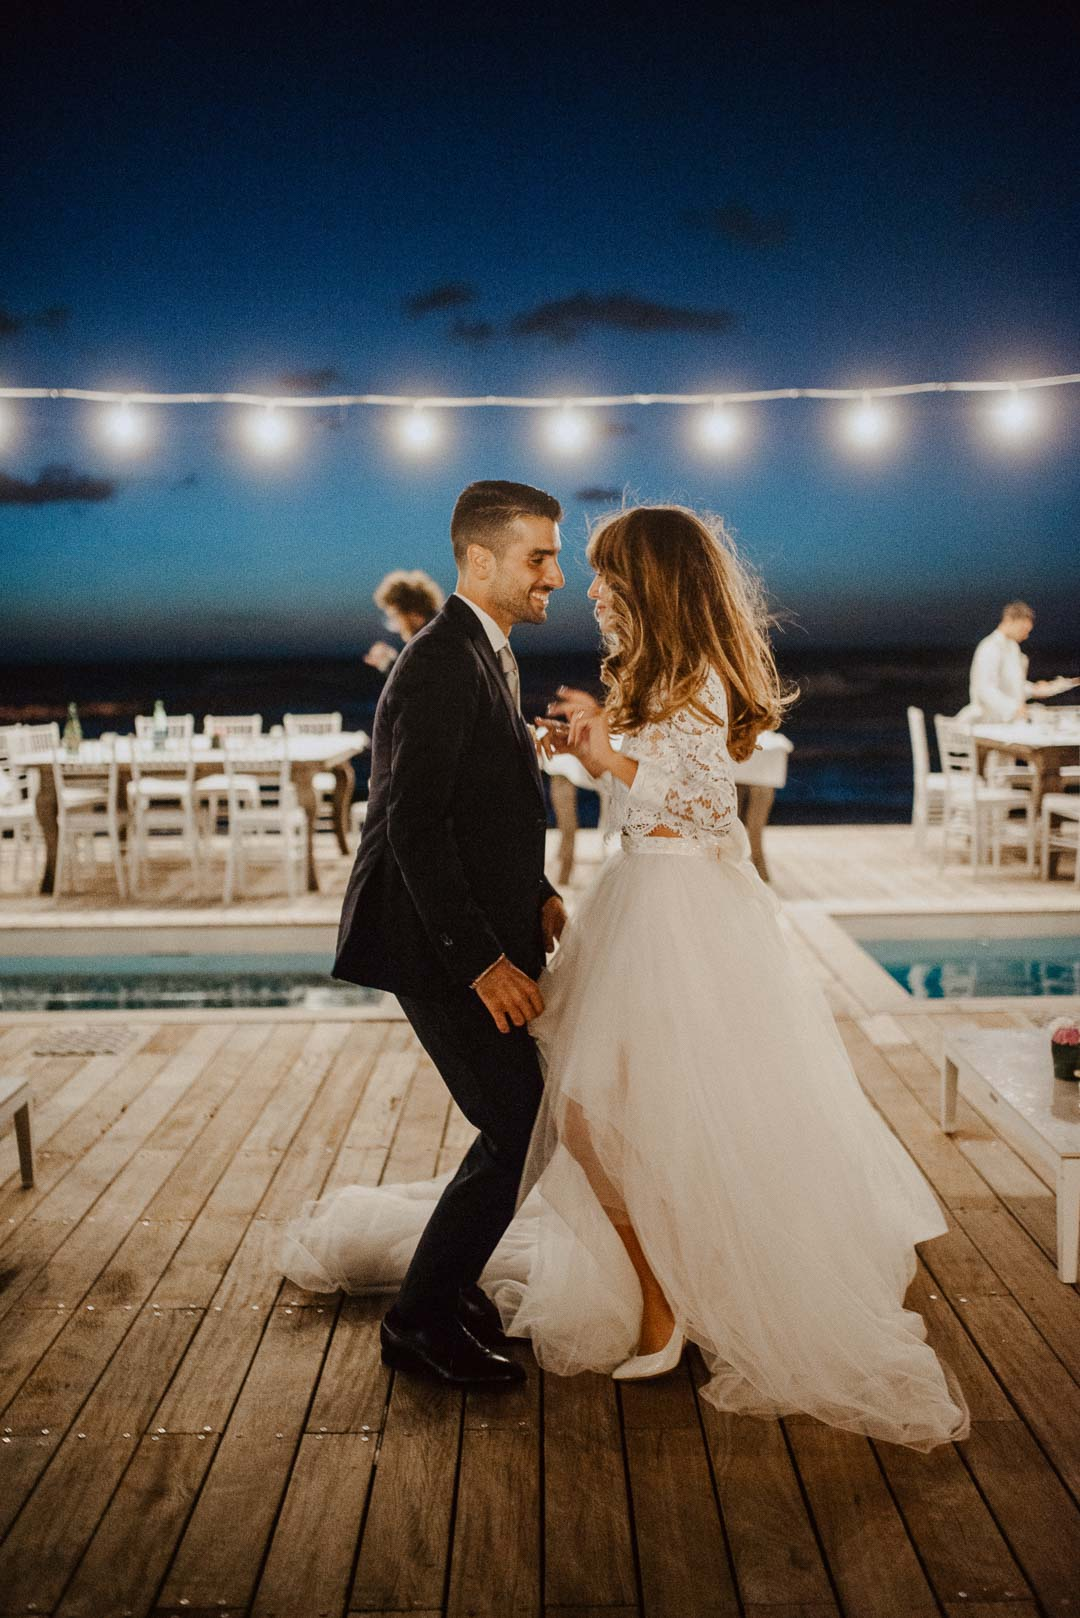 wedding-photographer-destination-fineart-bespoke-reportage-napoli-nabilah-vivianeizzo-spazio46-161